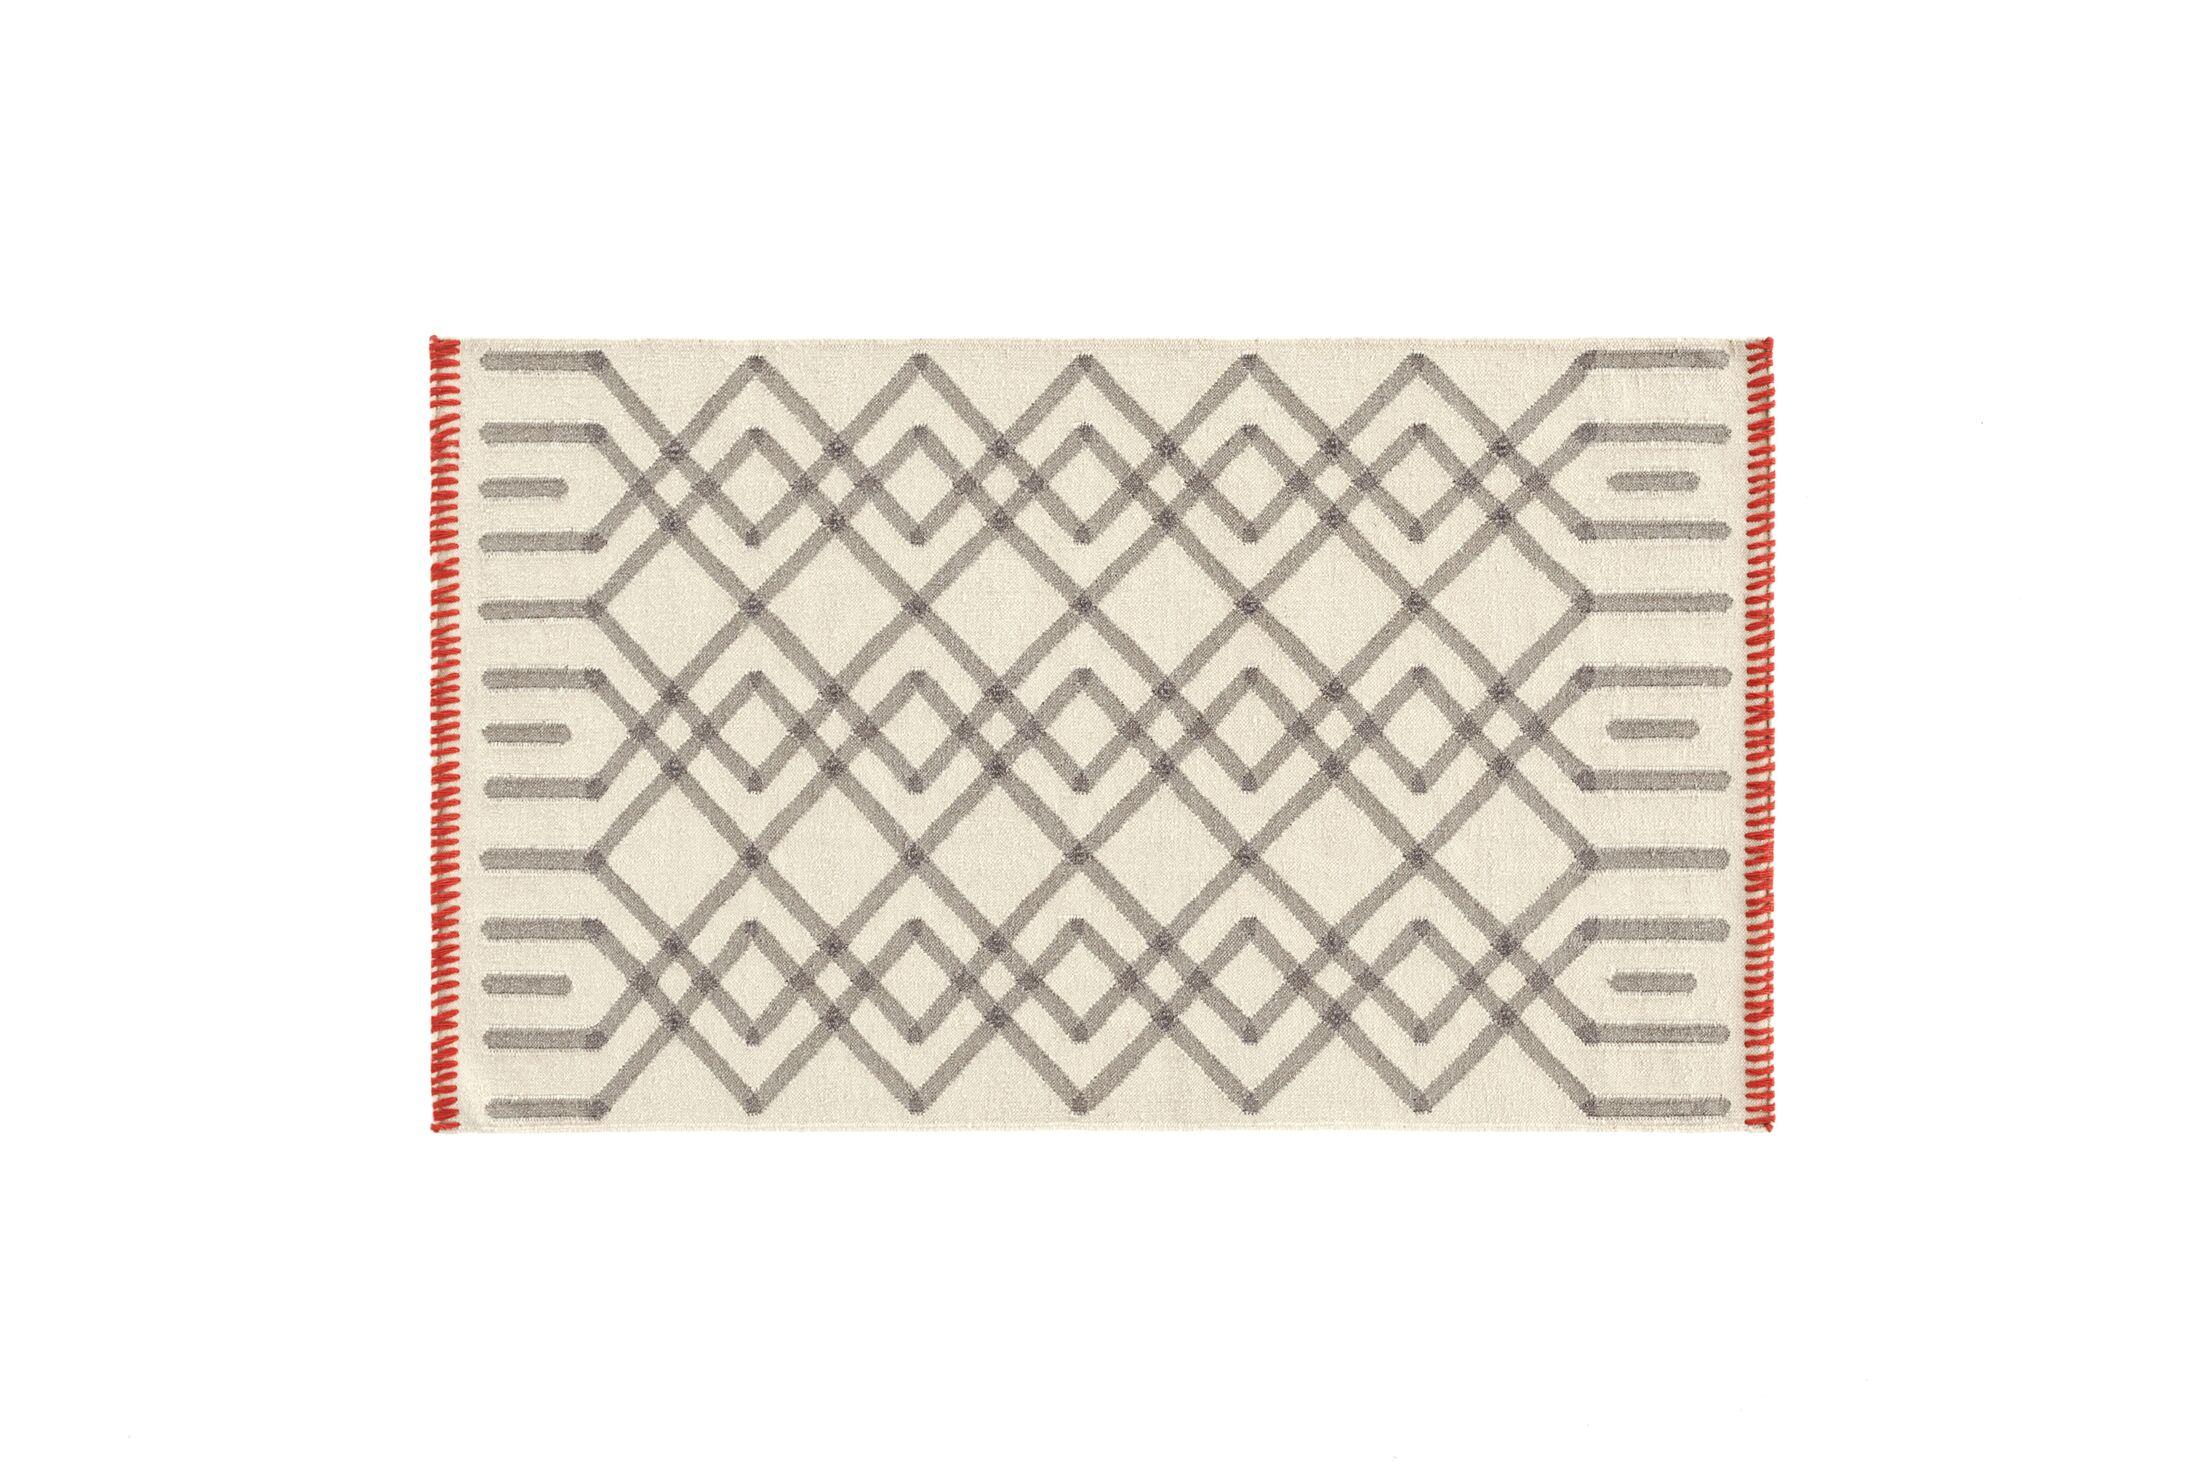 Duna Handmade Kilim Wool Gris Area Rug Rug Size: Rectangle 2'8